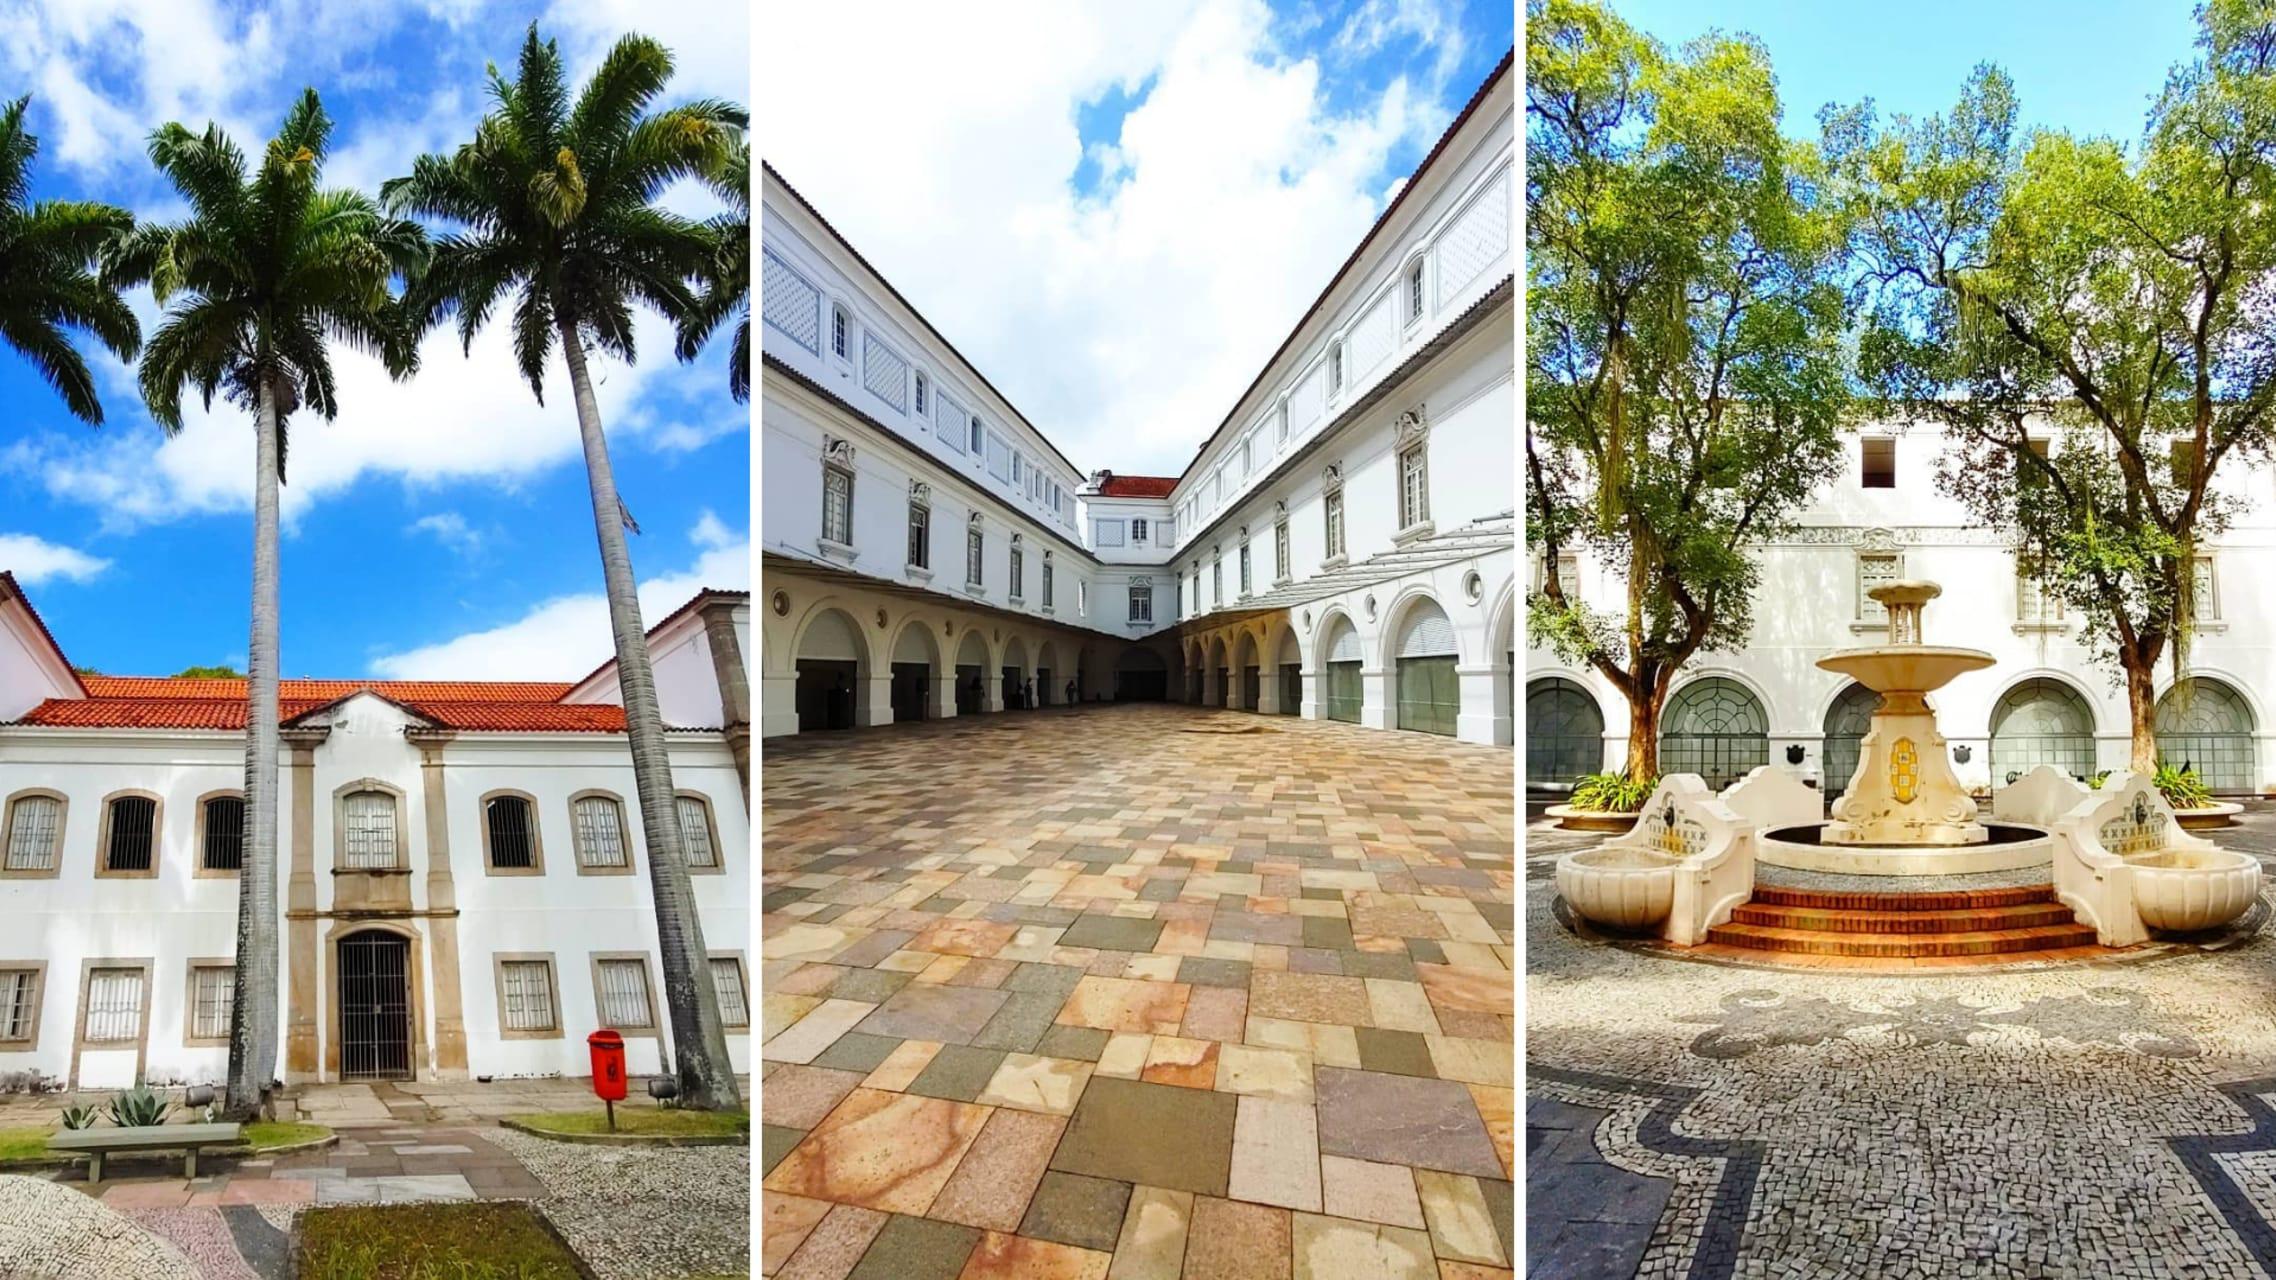 Rio de Janeiro - National Historical Museum in Rio de Janeiro